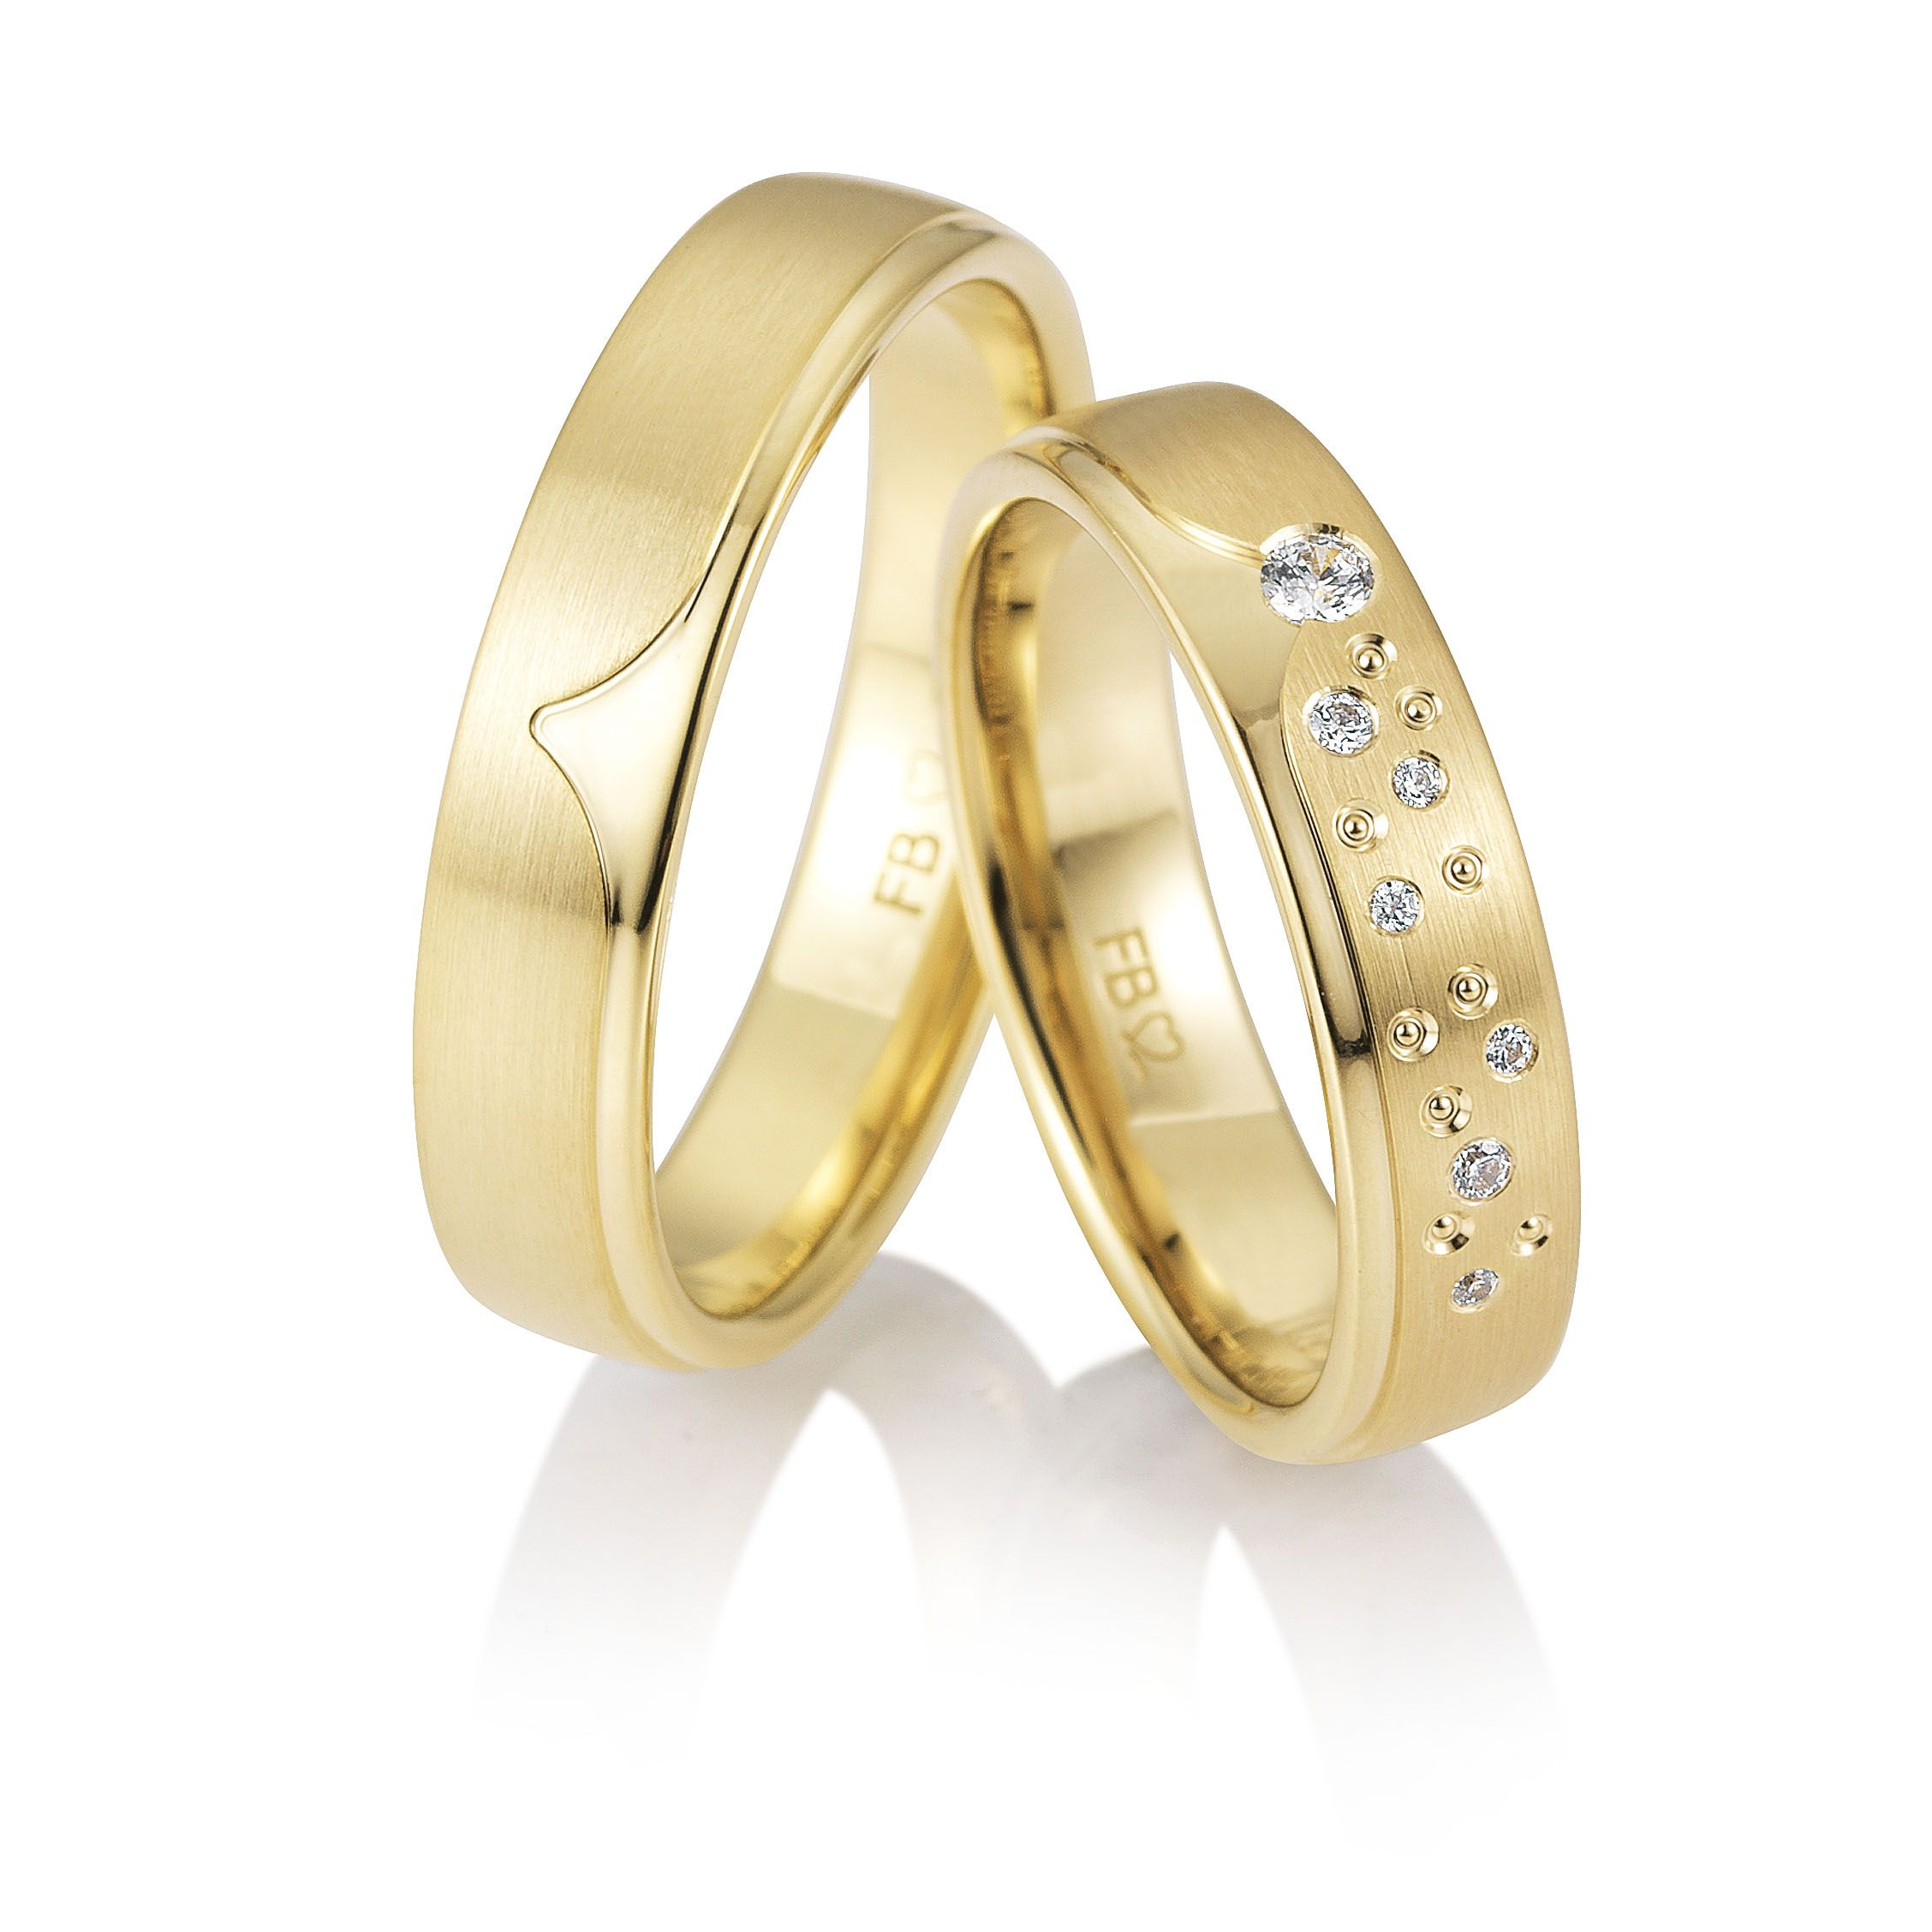 Eheringe Trauringe Breuning Gelbgold 48 05889 585 Gold